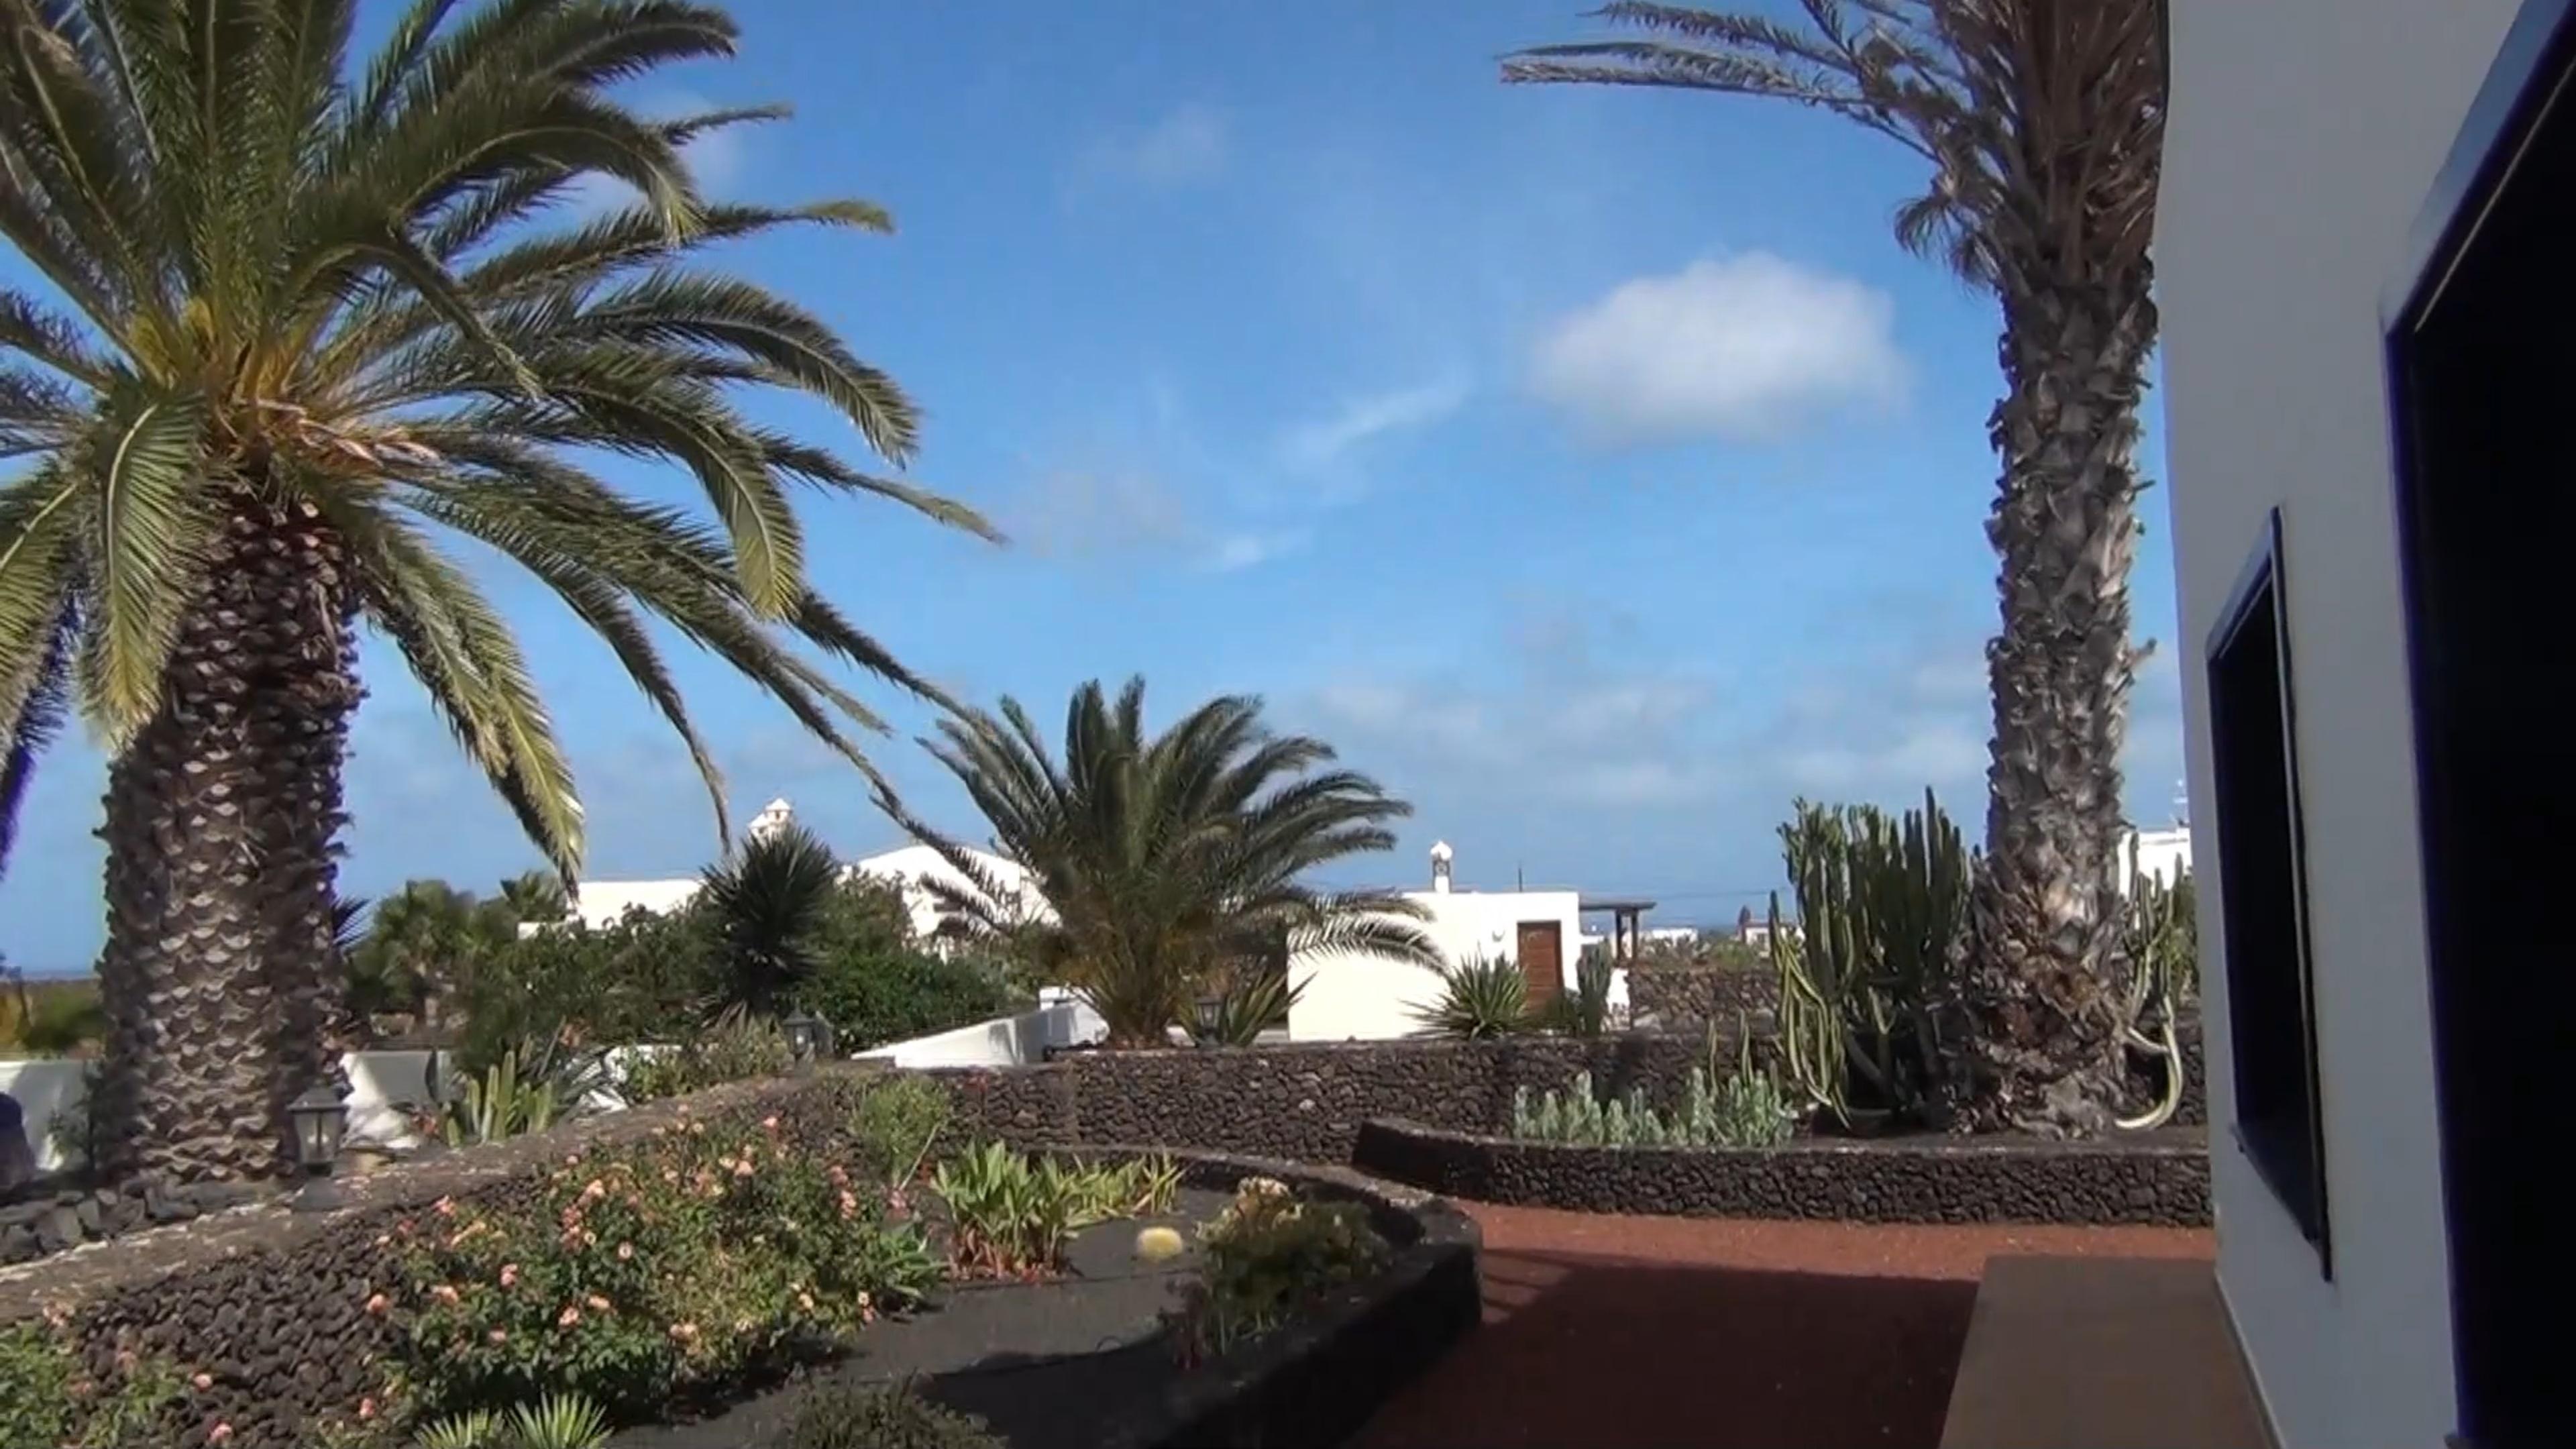 YouTube 160926 Gardens in Mala